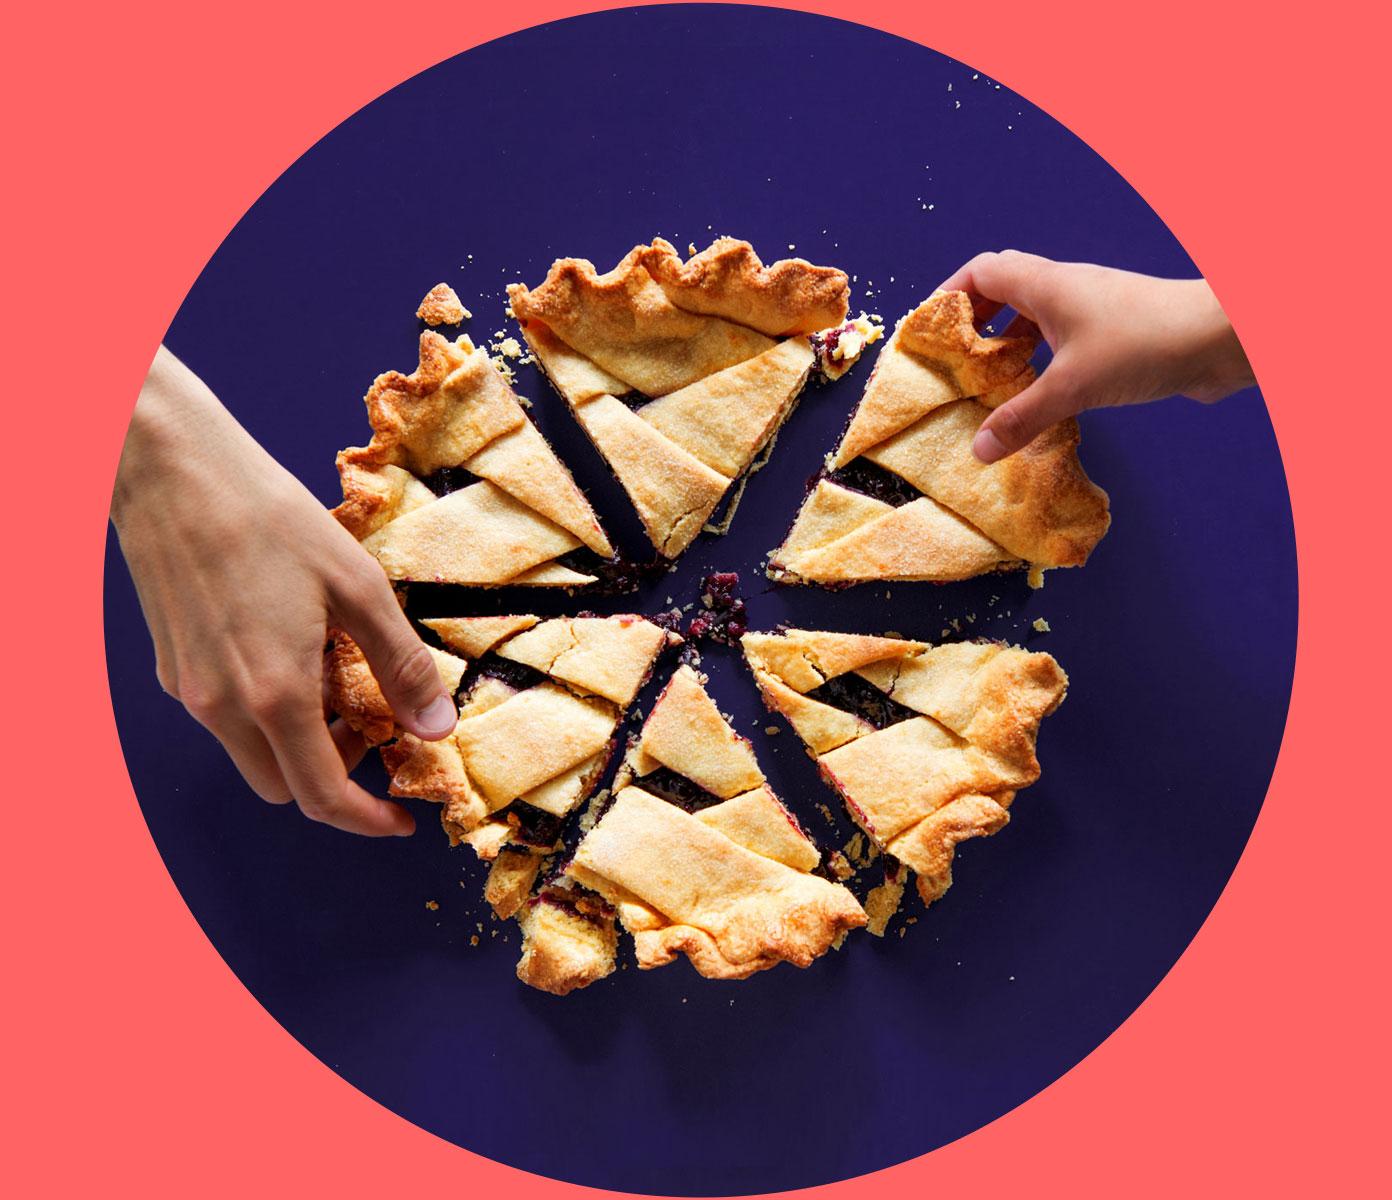 17.09.26_Share-the-Pie-4.2.jpg